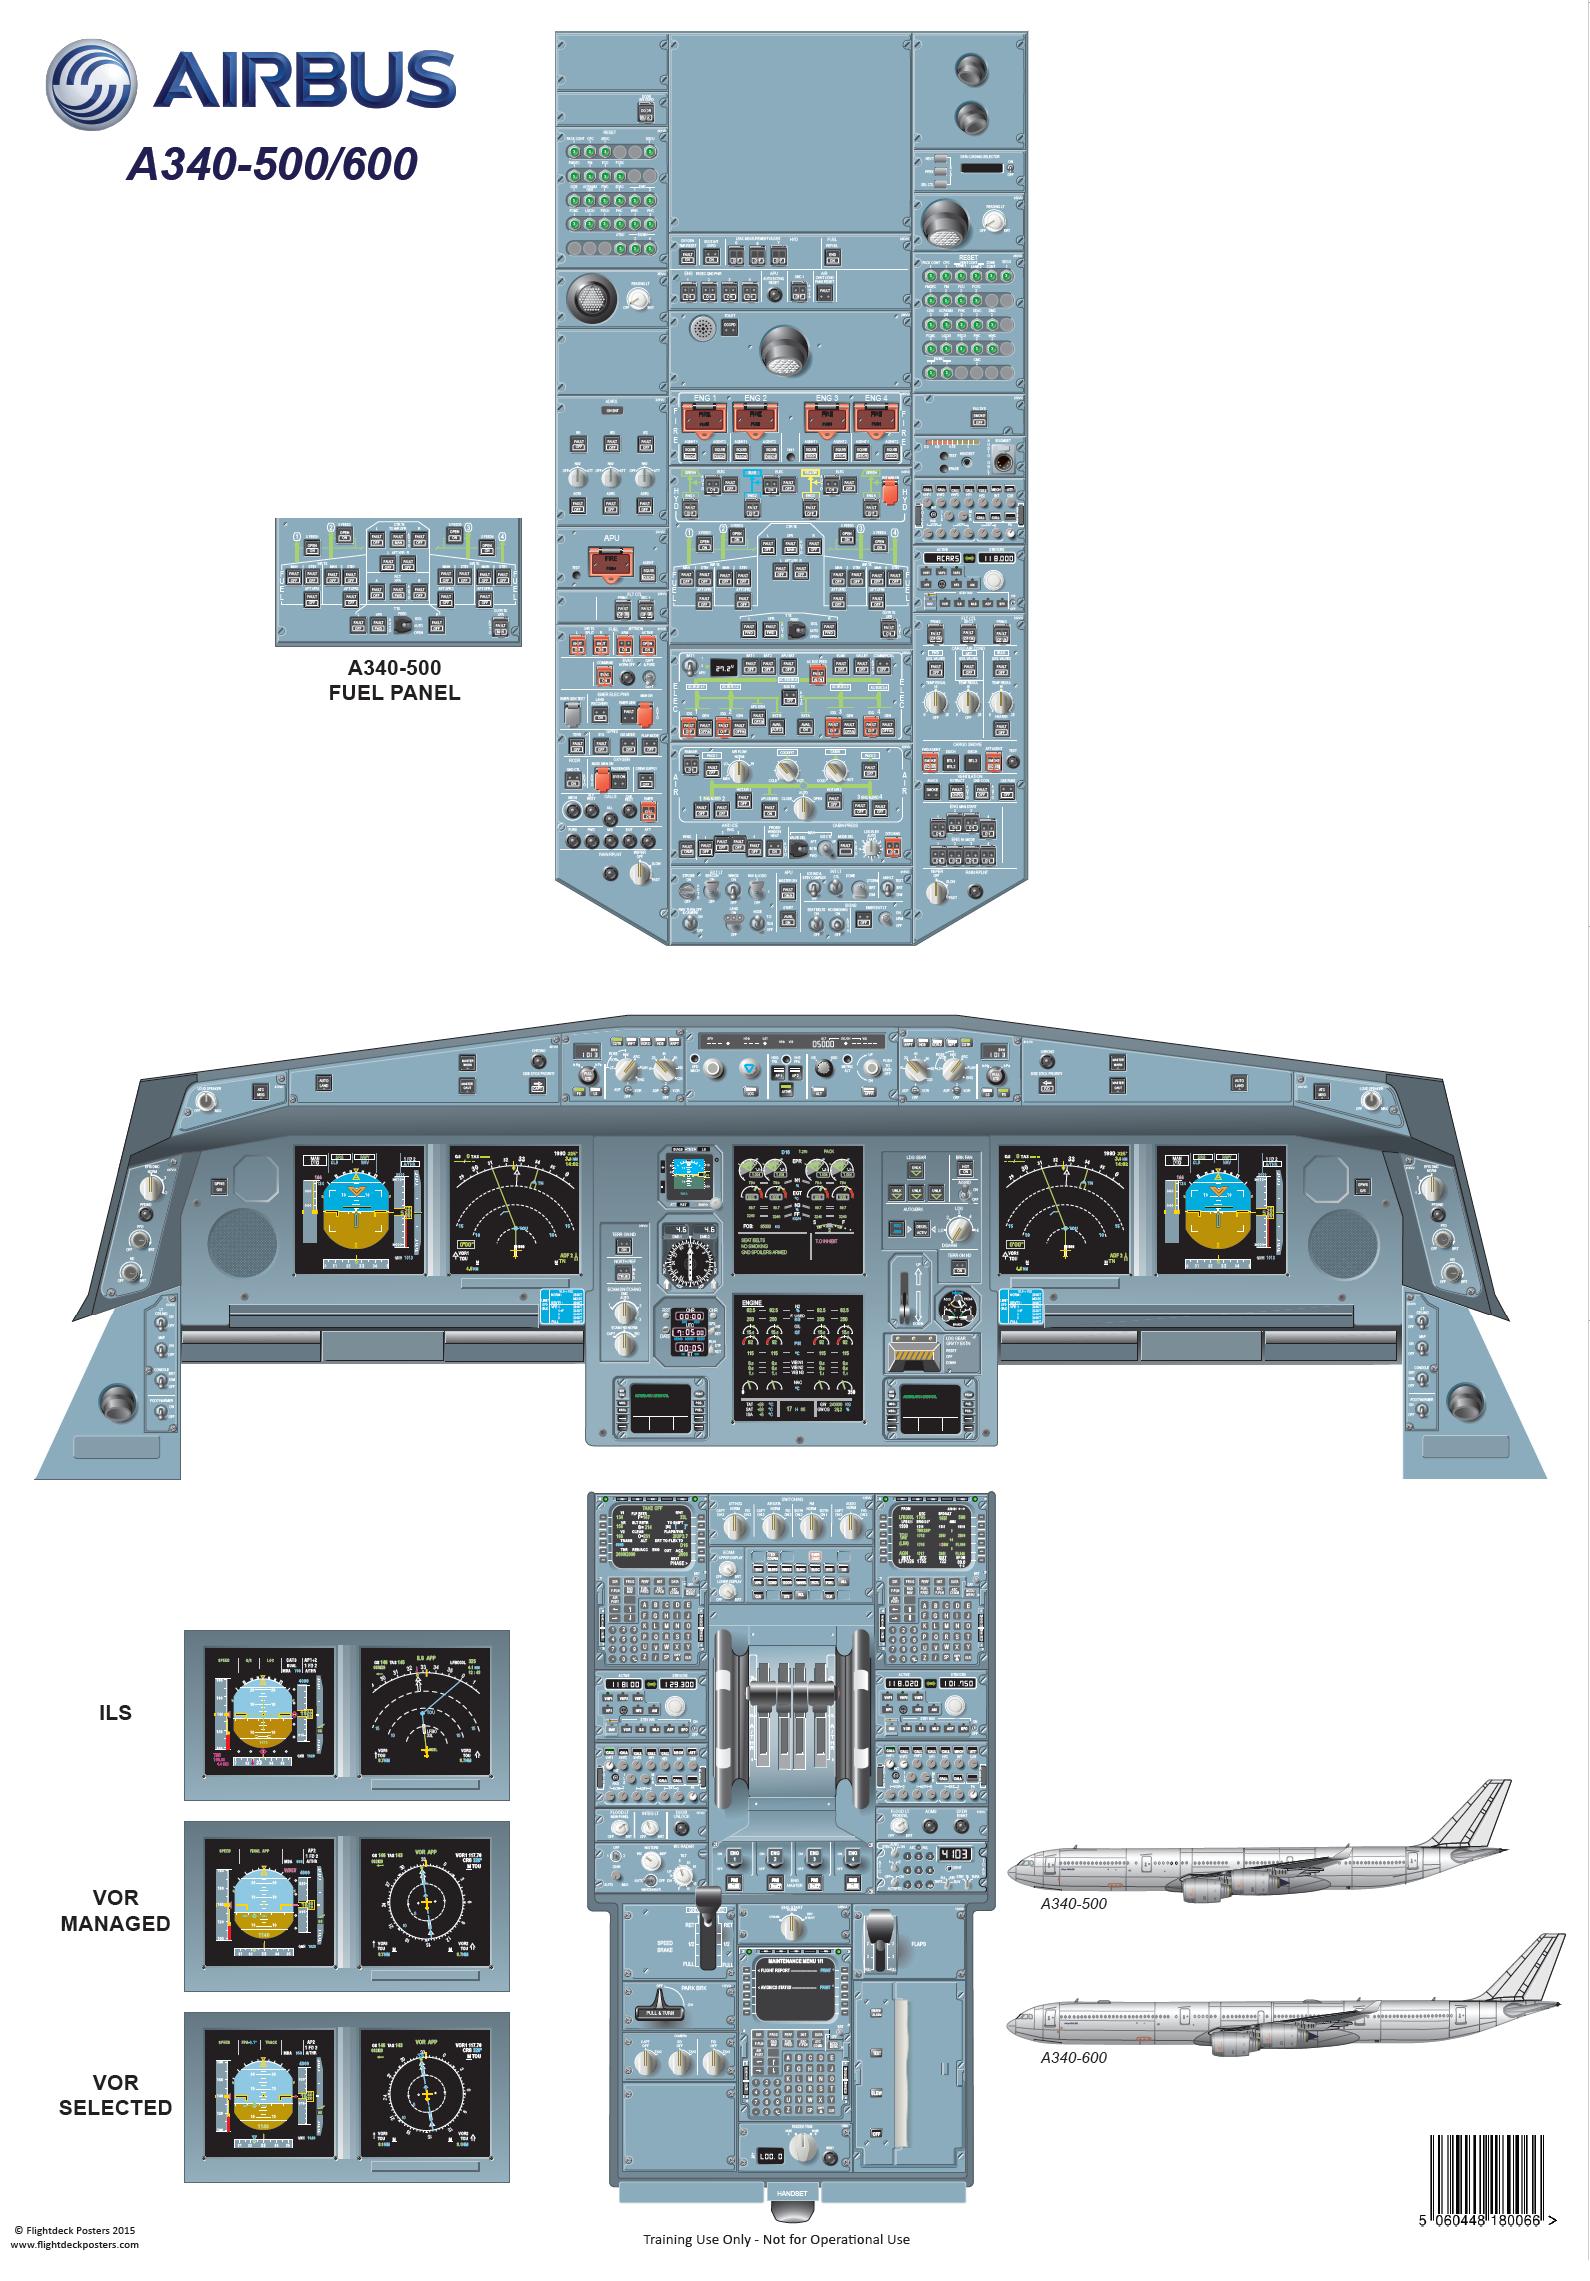 Airbus A340 500 600 Cockpit Poster Used For Training Pilots Airbus Cockpit Flight Simulator Cockpit